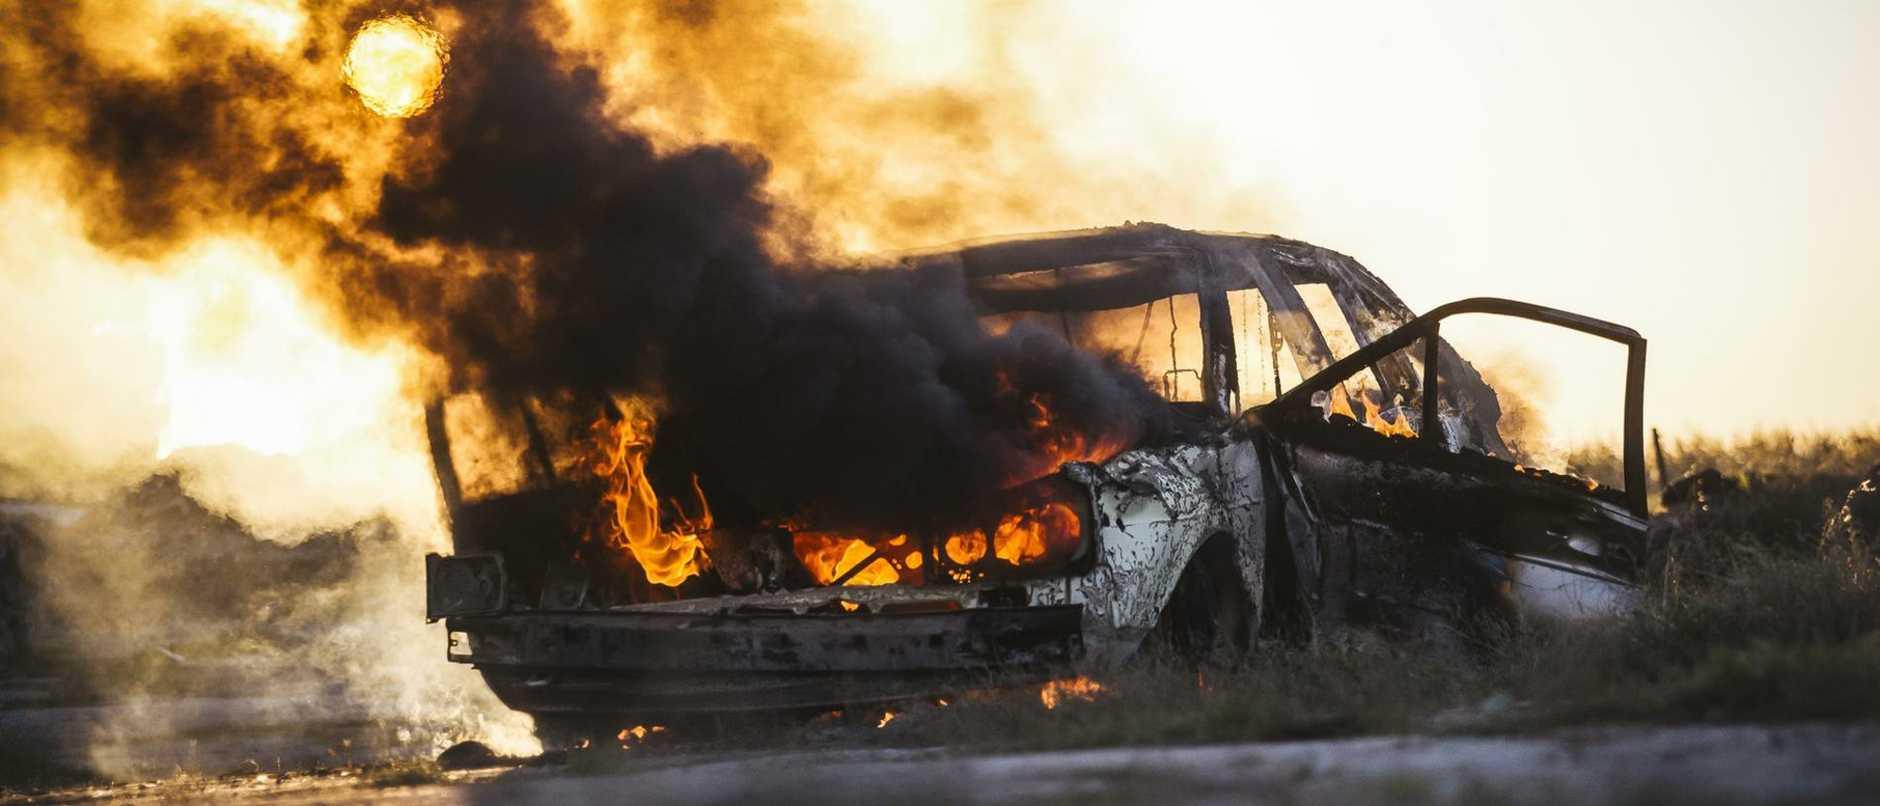 Burning car covered in black smoke